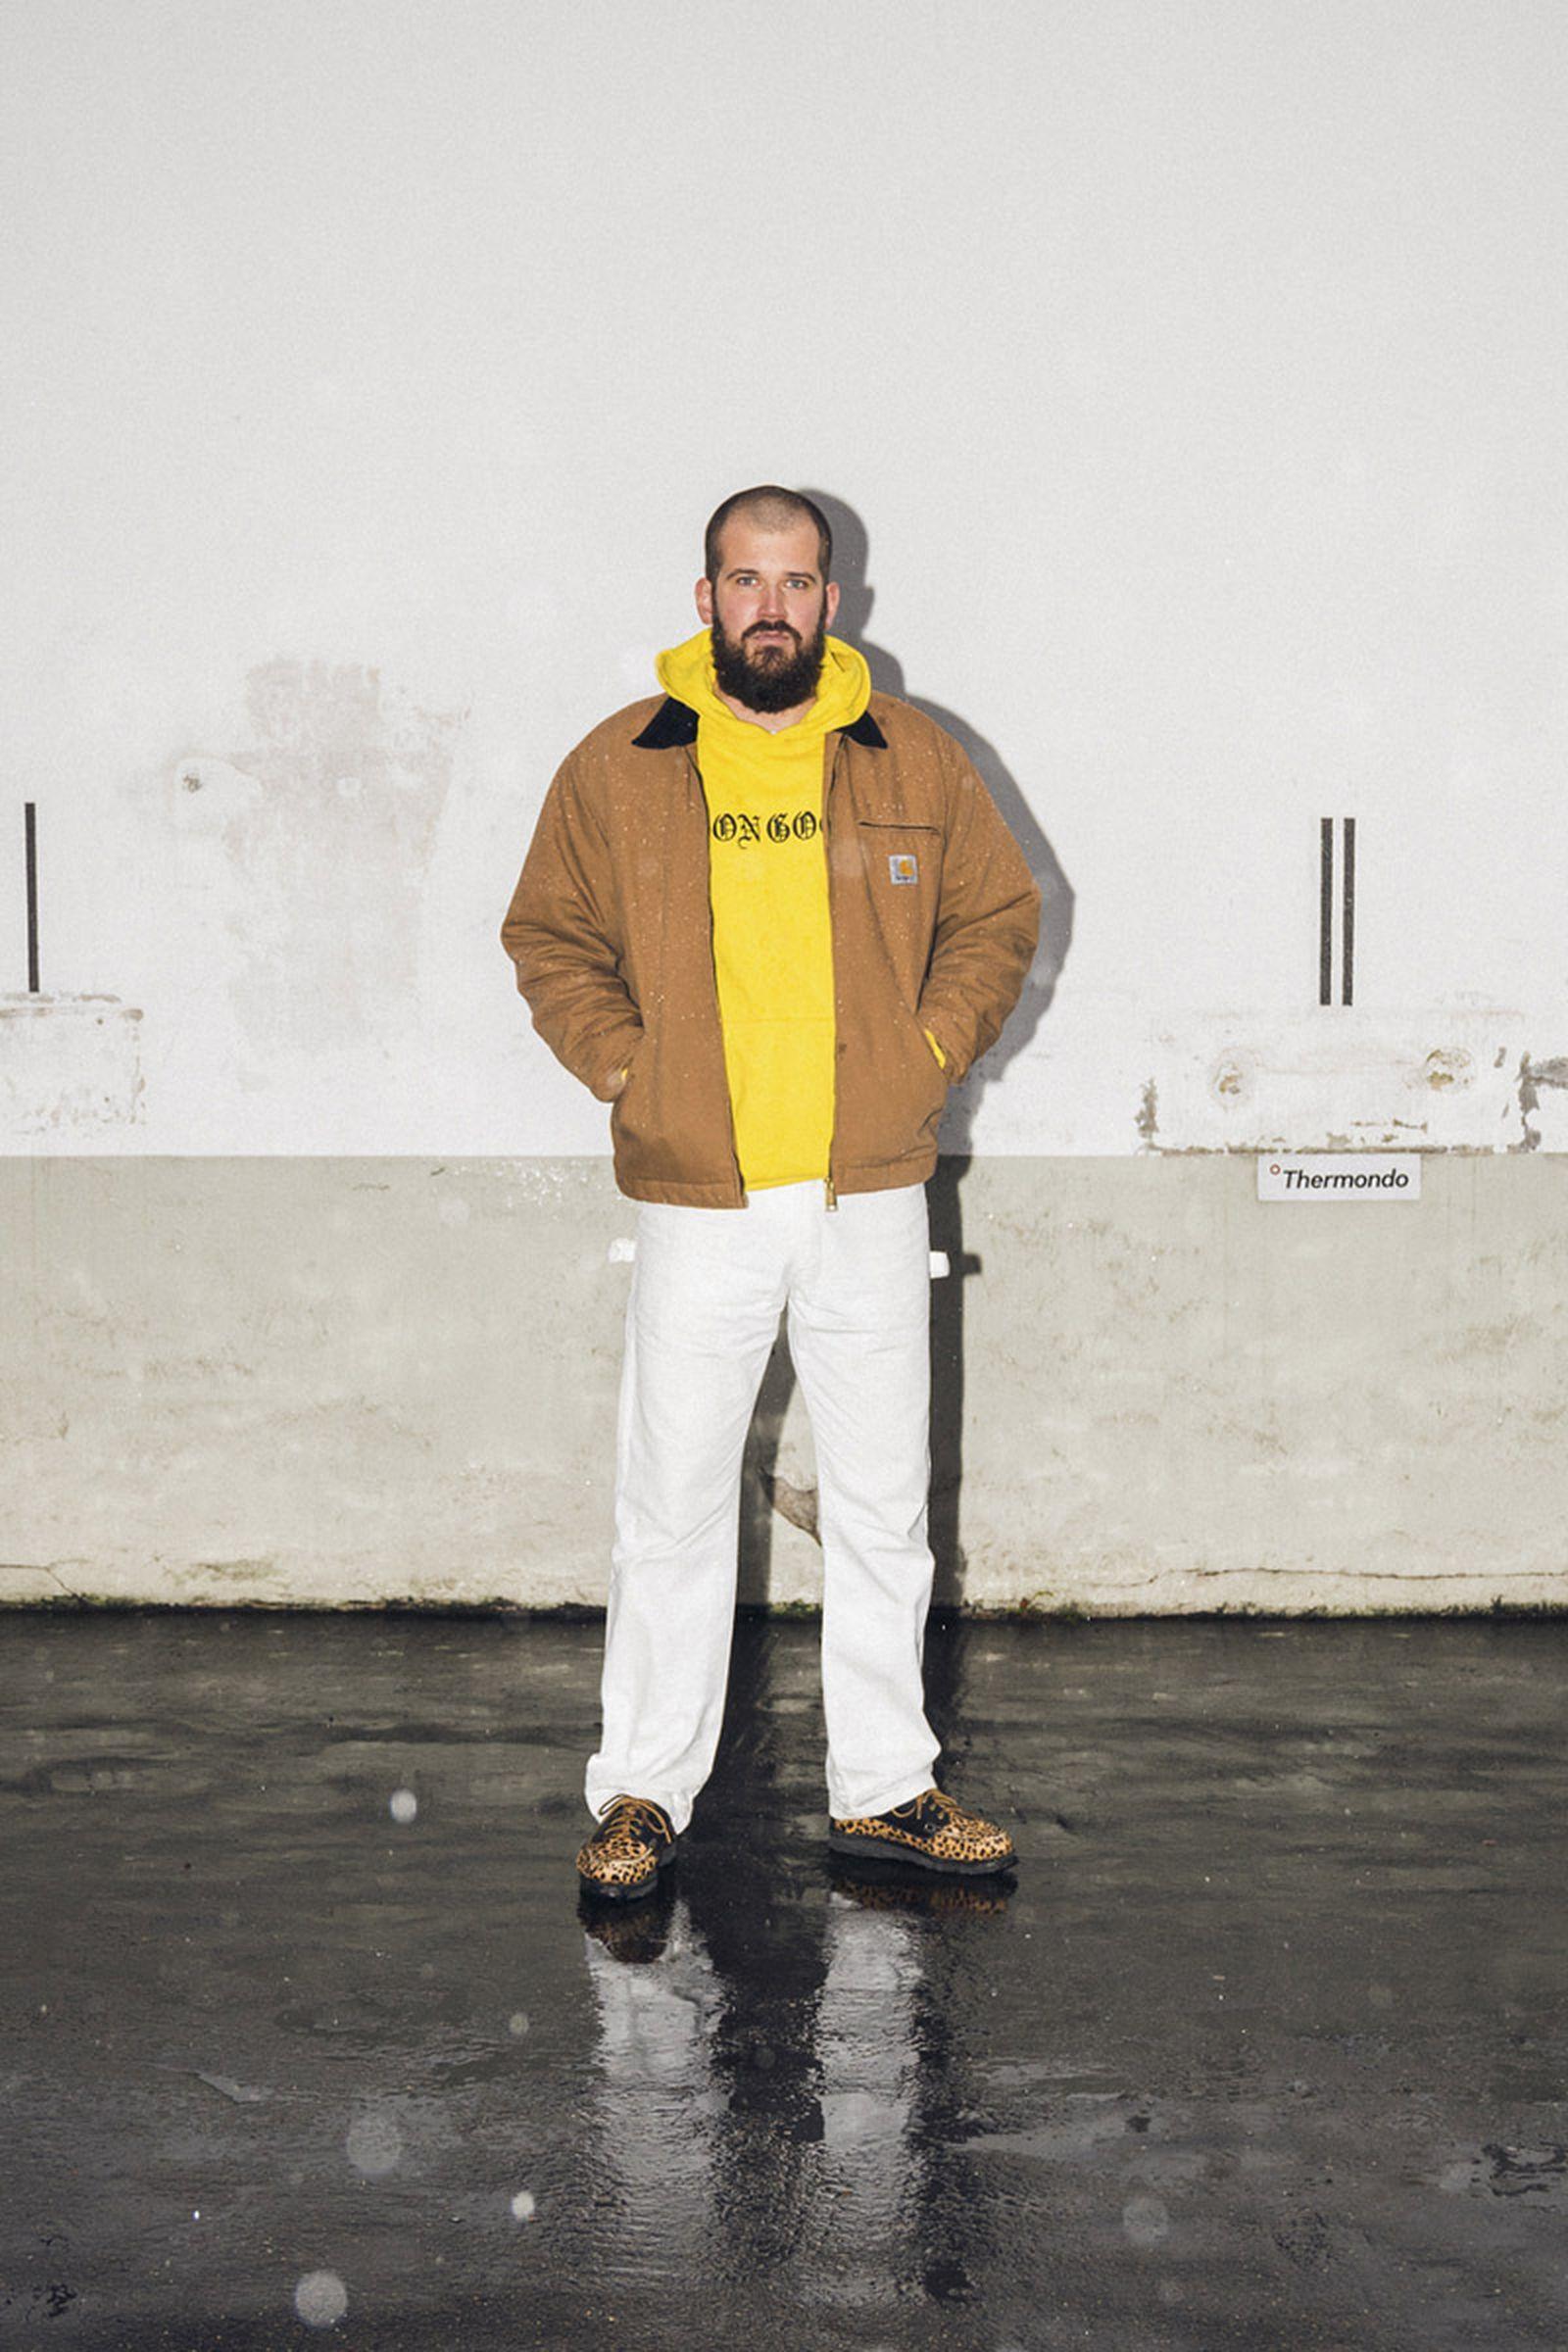 beinghunted-robert-smithson-not-in-paris-@hendrikjuergens-800x1200